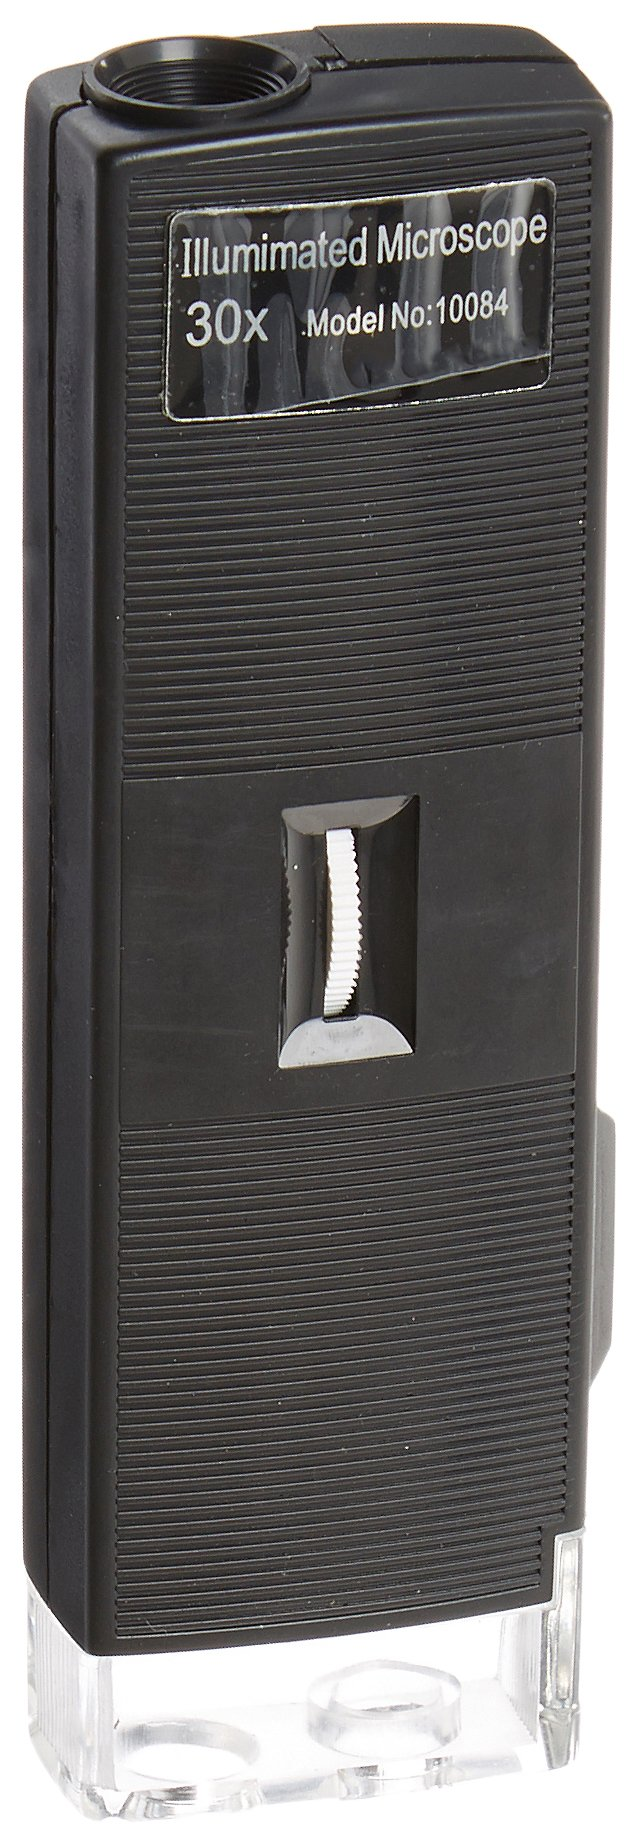 United Scientific MCR30X Pocket Illuminated Microscope, 30x Magnification, Battery-Powered